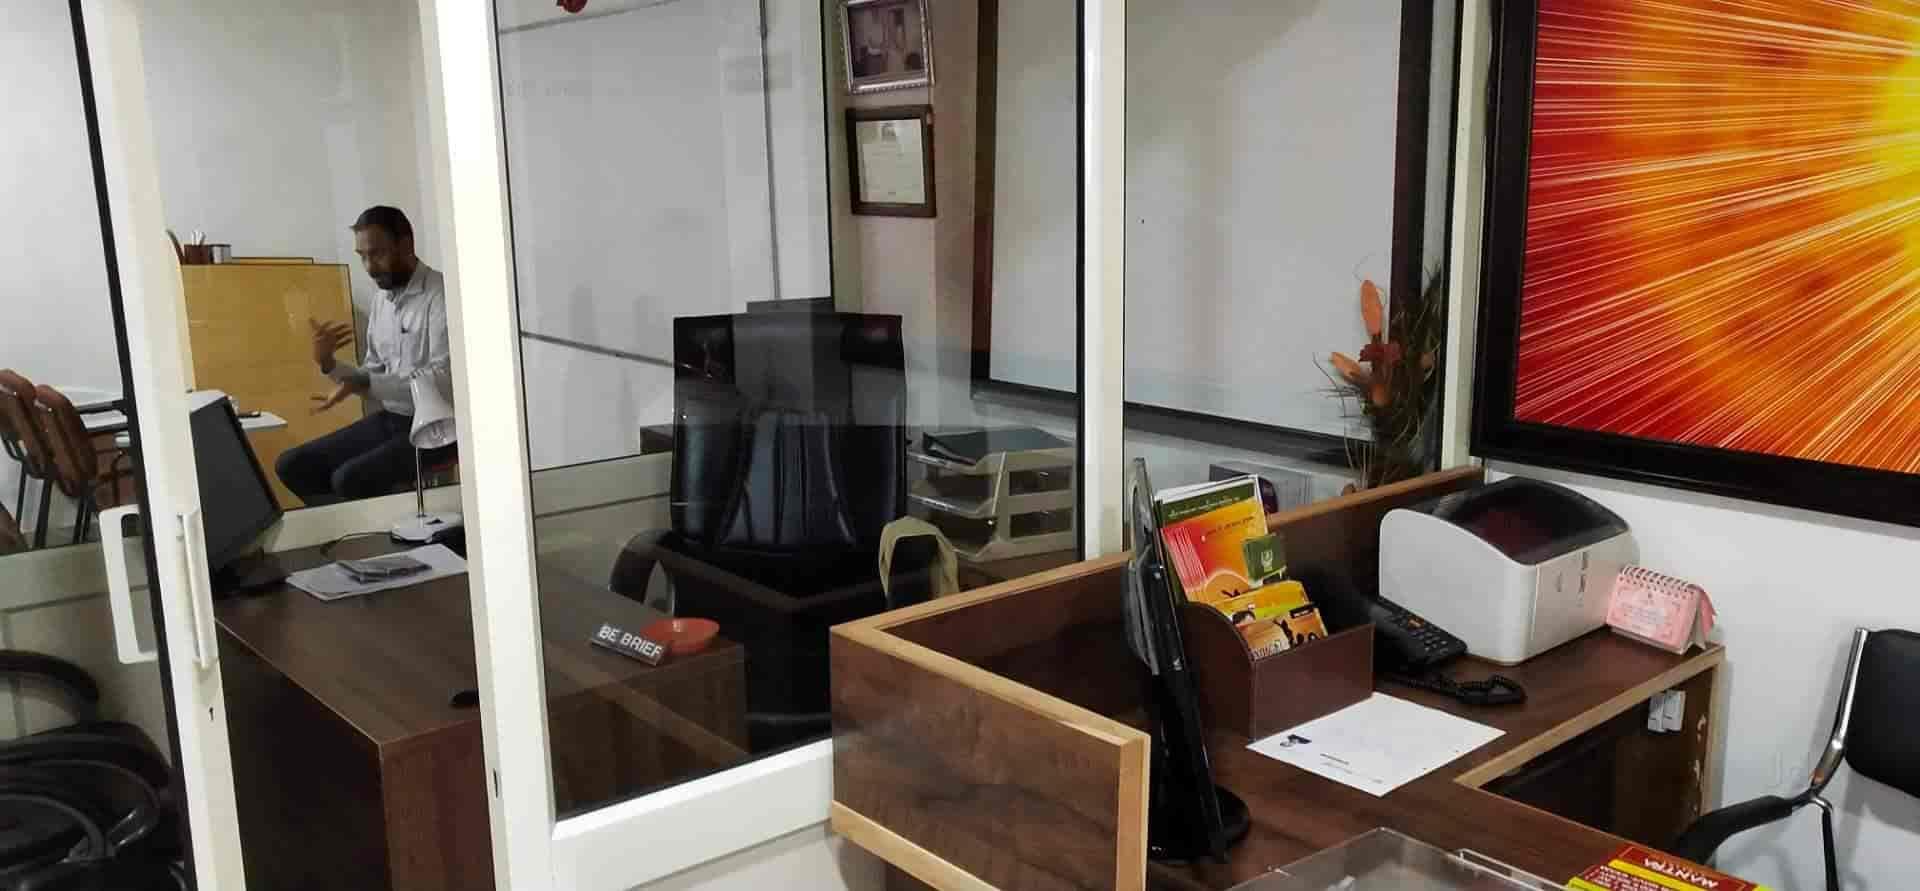 Career Planet IAS, Aggar Nagar - IAS Institutes in Ludhiana